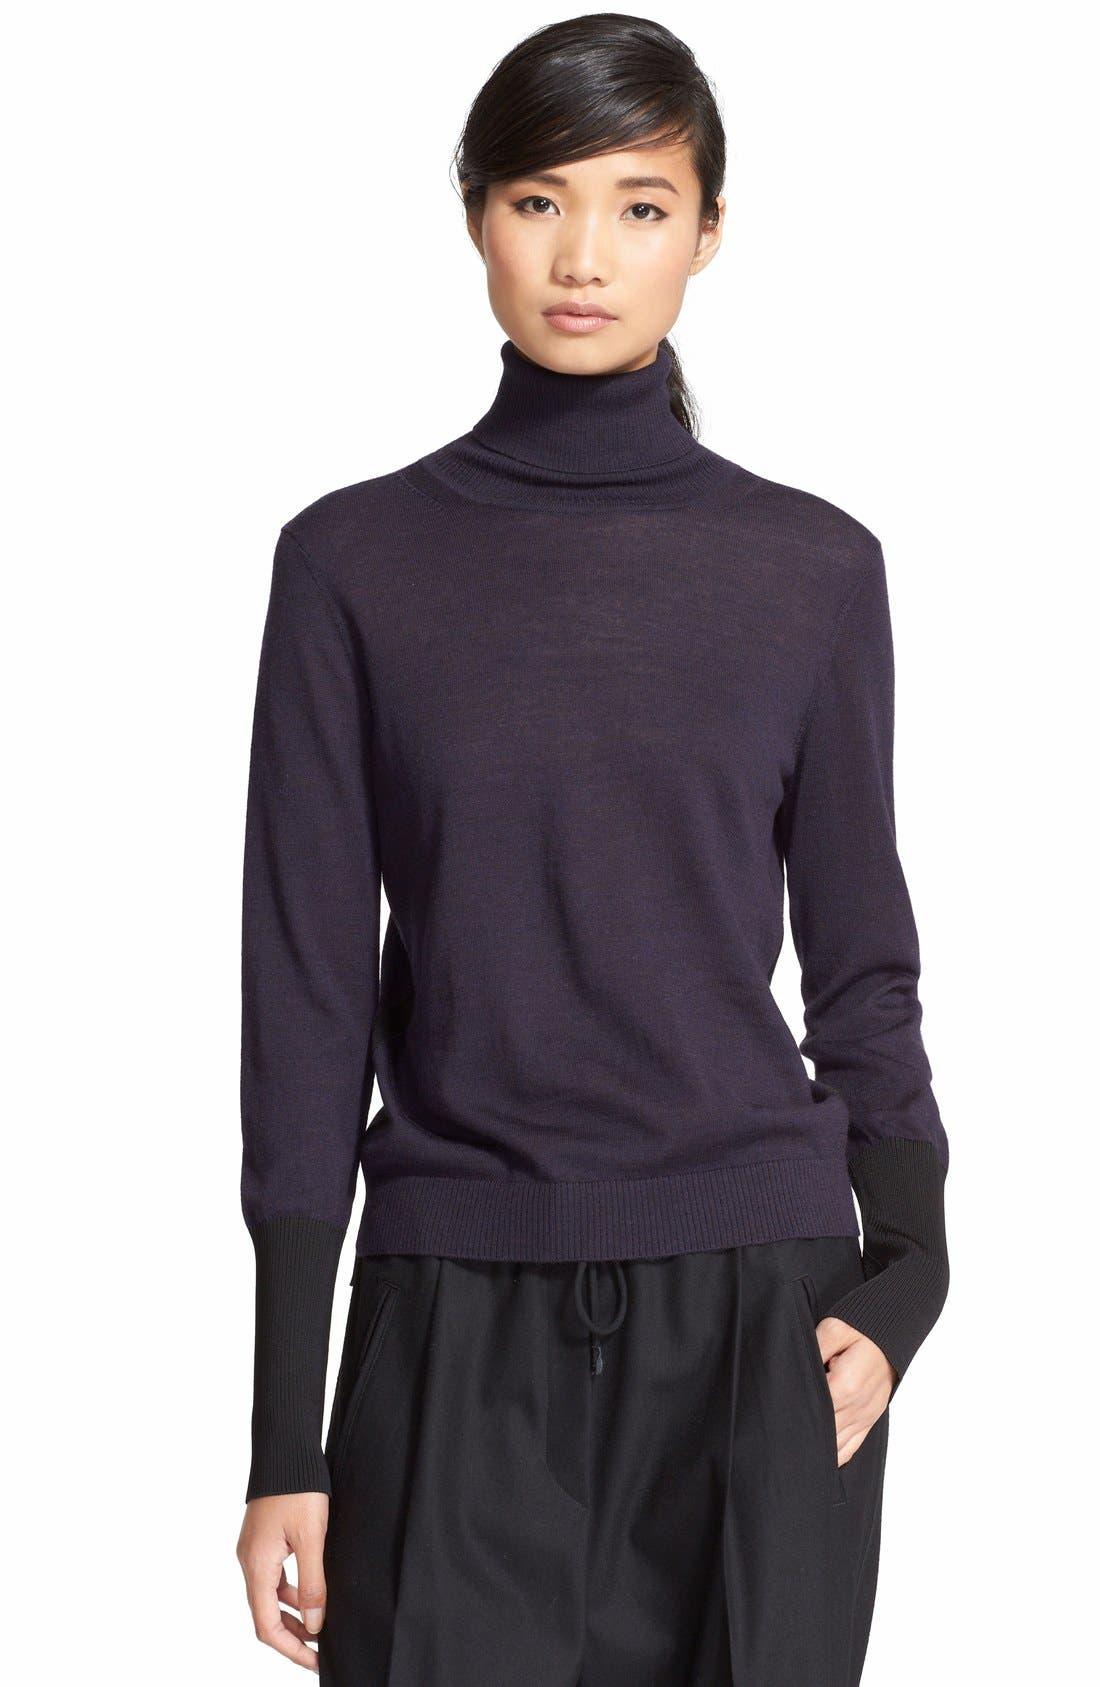 'Jessica' Wool Blend Turtleneck Sweater,                         Main,                         color, 001